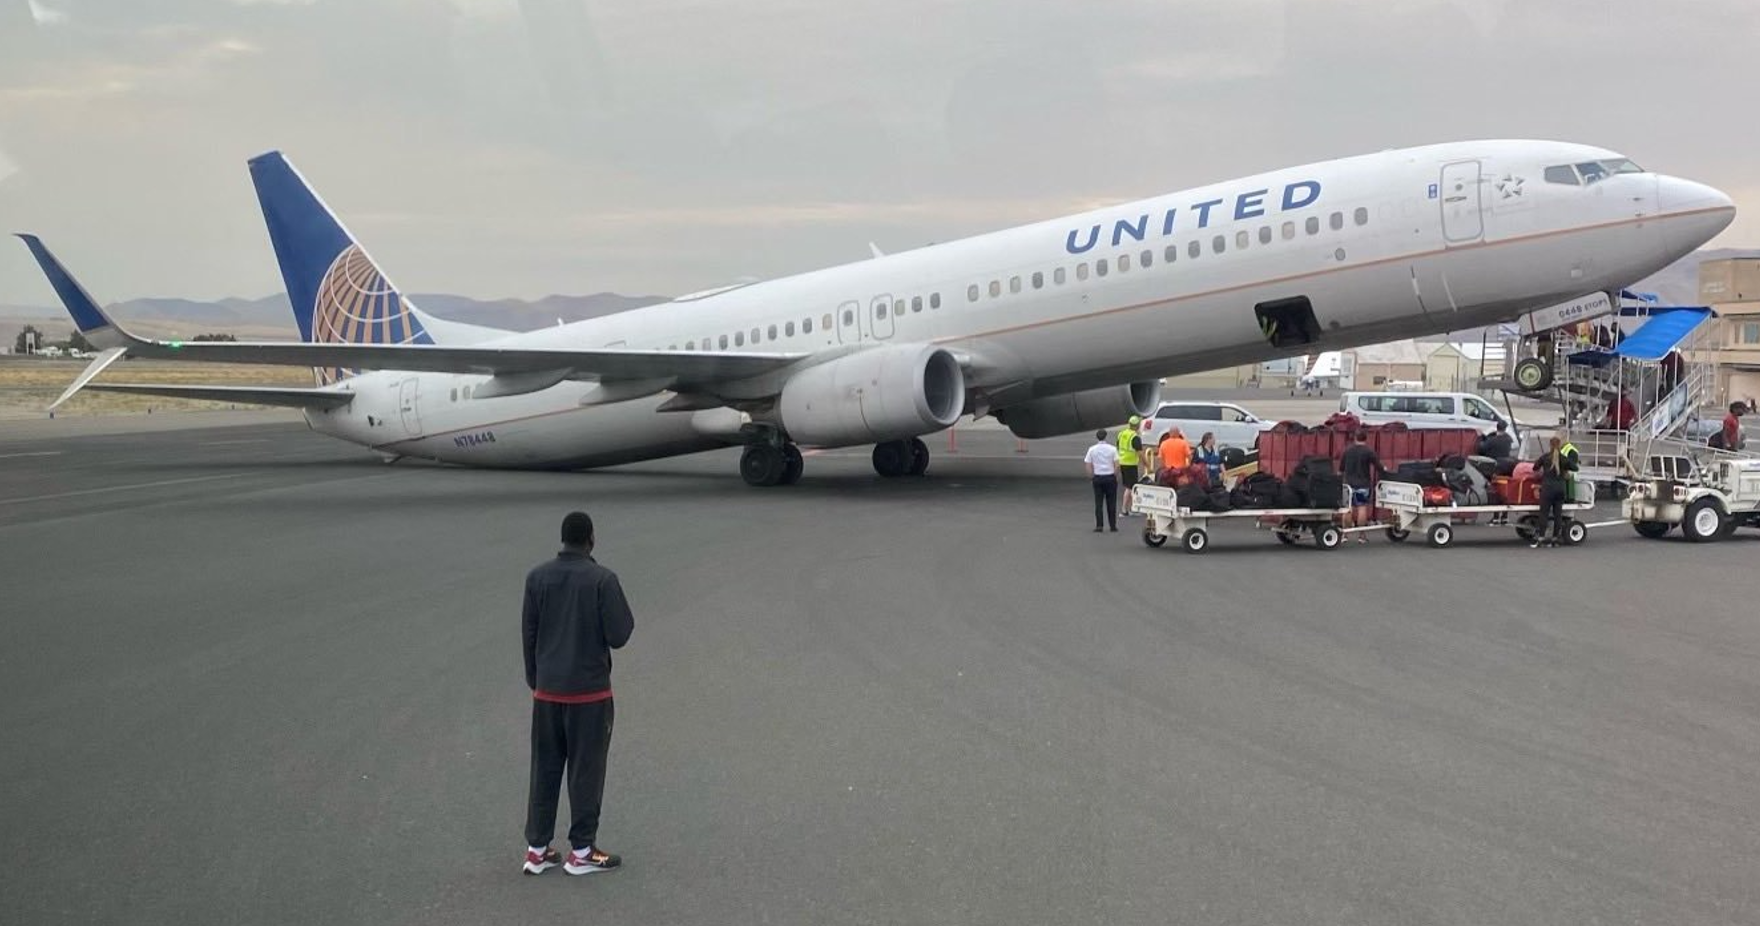 UA2509 Boeing 737-900 efter landing i Lewiston Nez Perce County Airport i Lewiston, Idaho. (Foto: Dave Stockton Jr | Twitter)